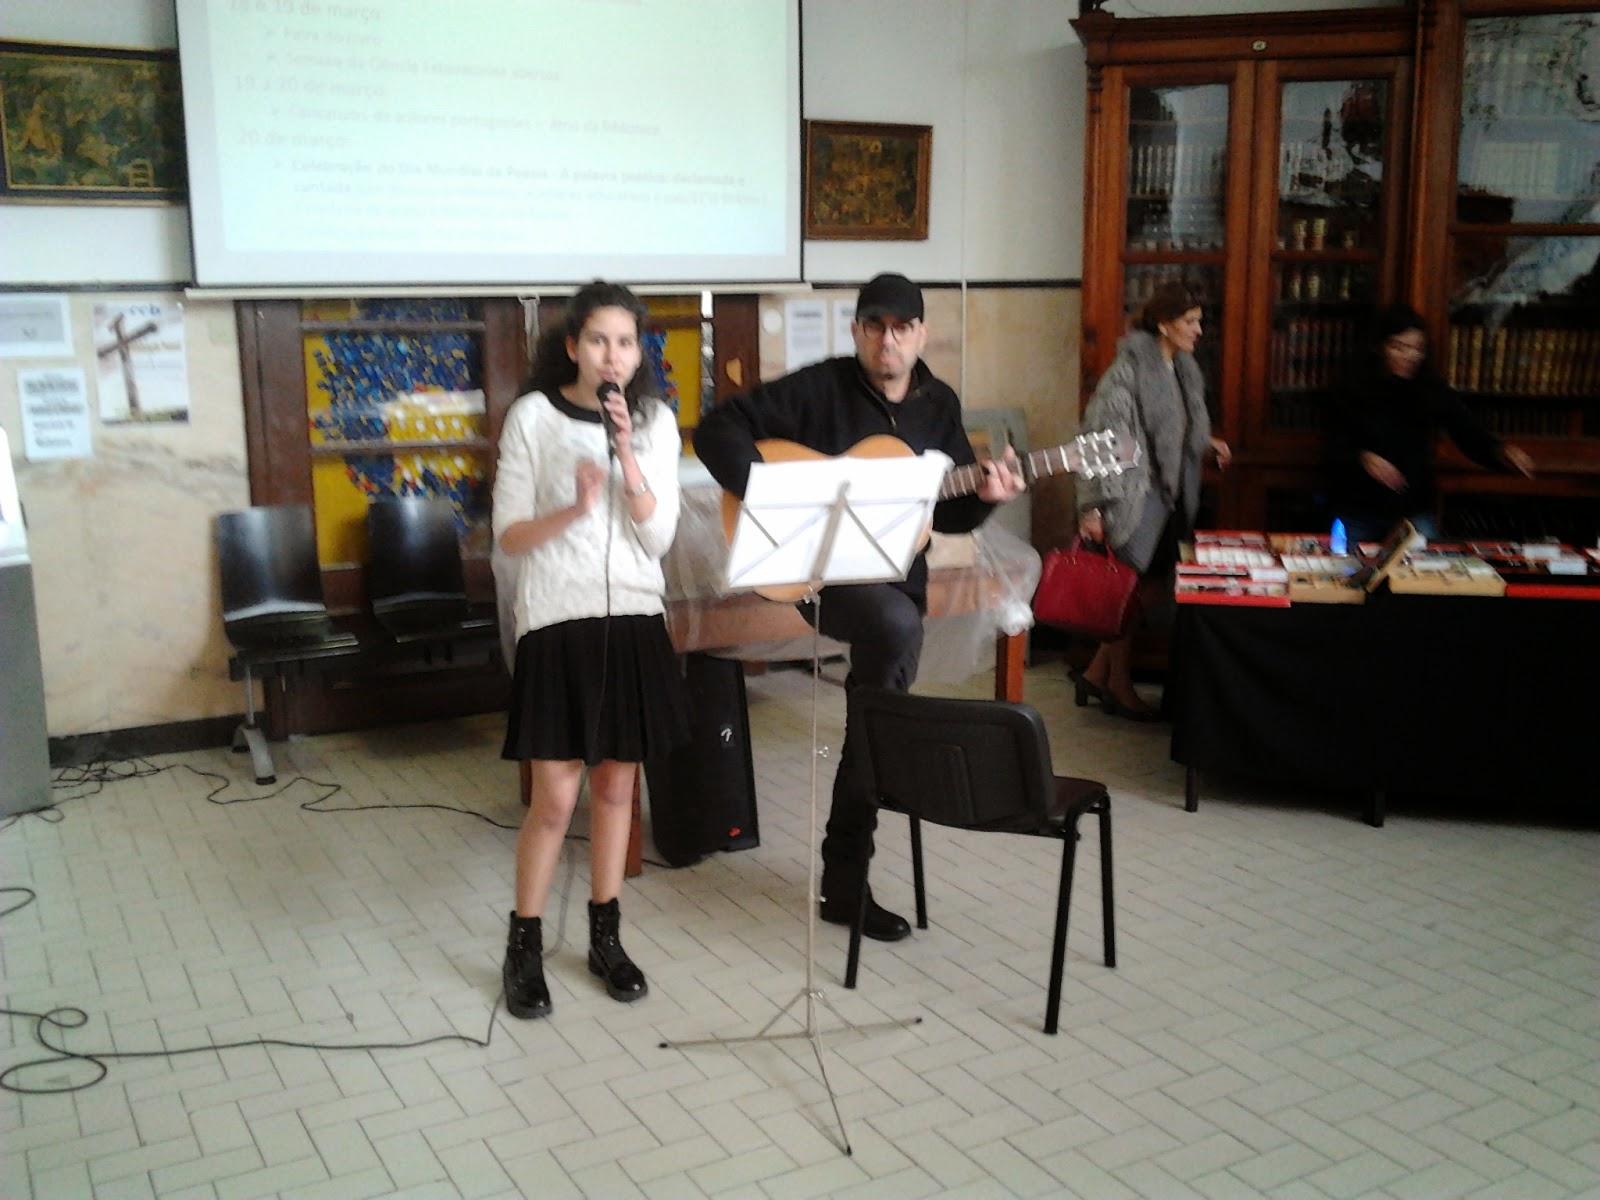 Biblioteca Camilo Castelo Branco VR: Março 2015